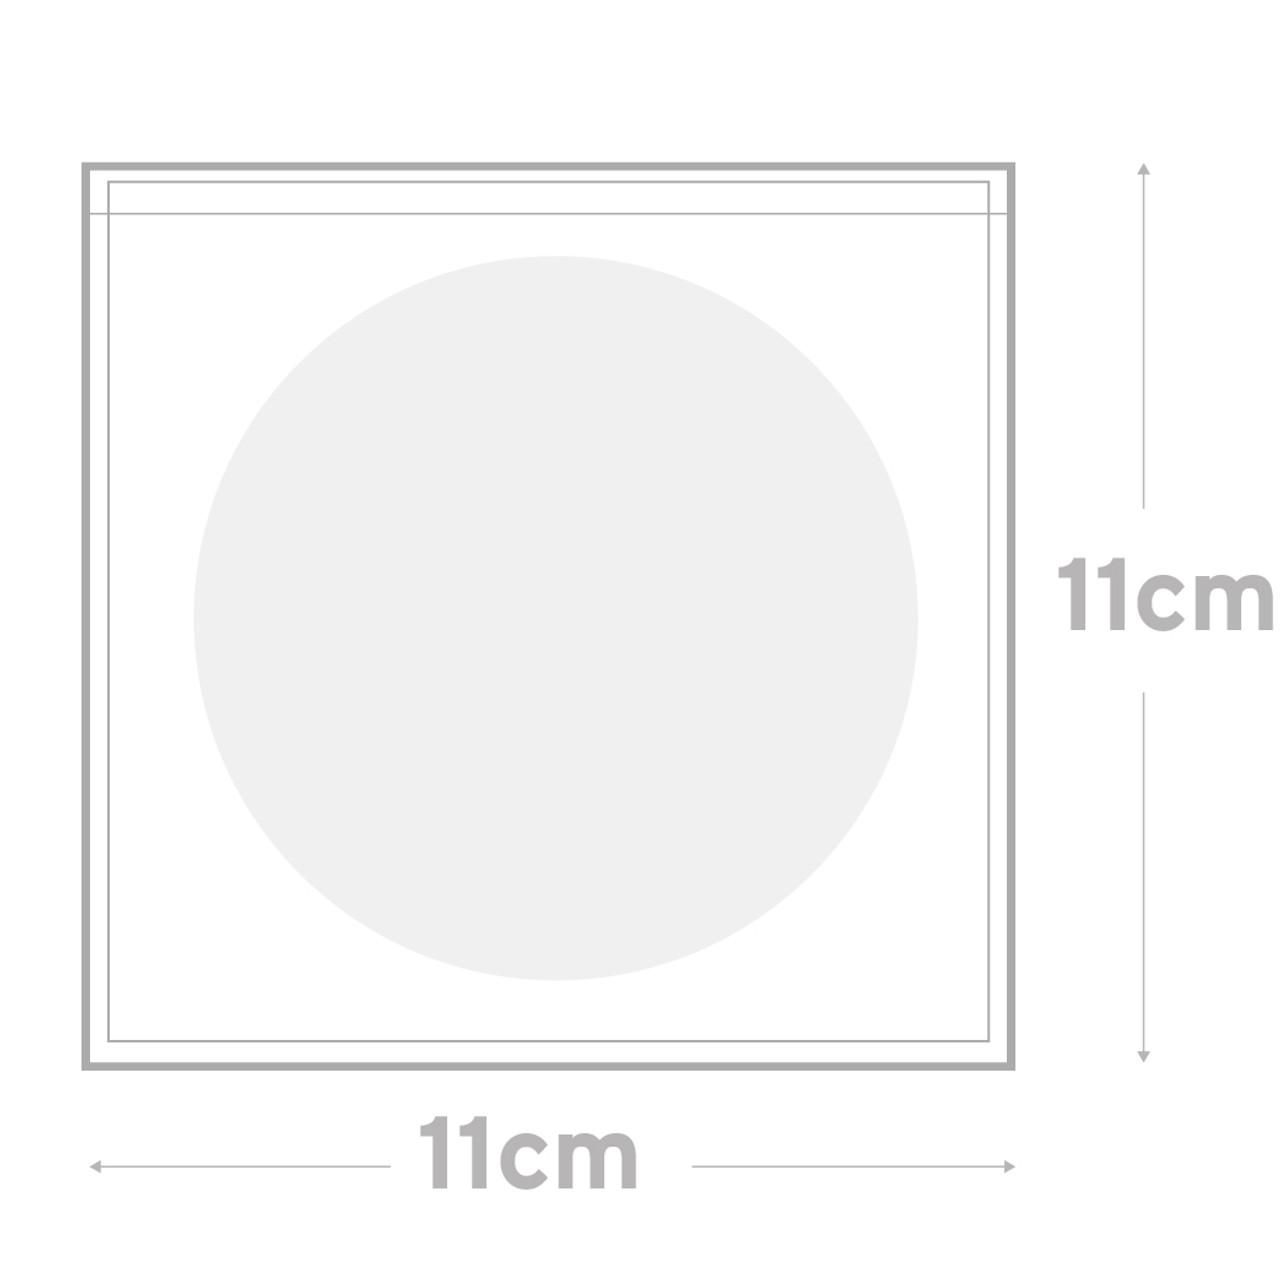 Peel & Seal Bag  Pkt 100 - 11 x 11 cm